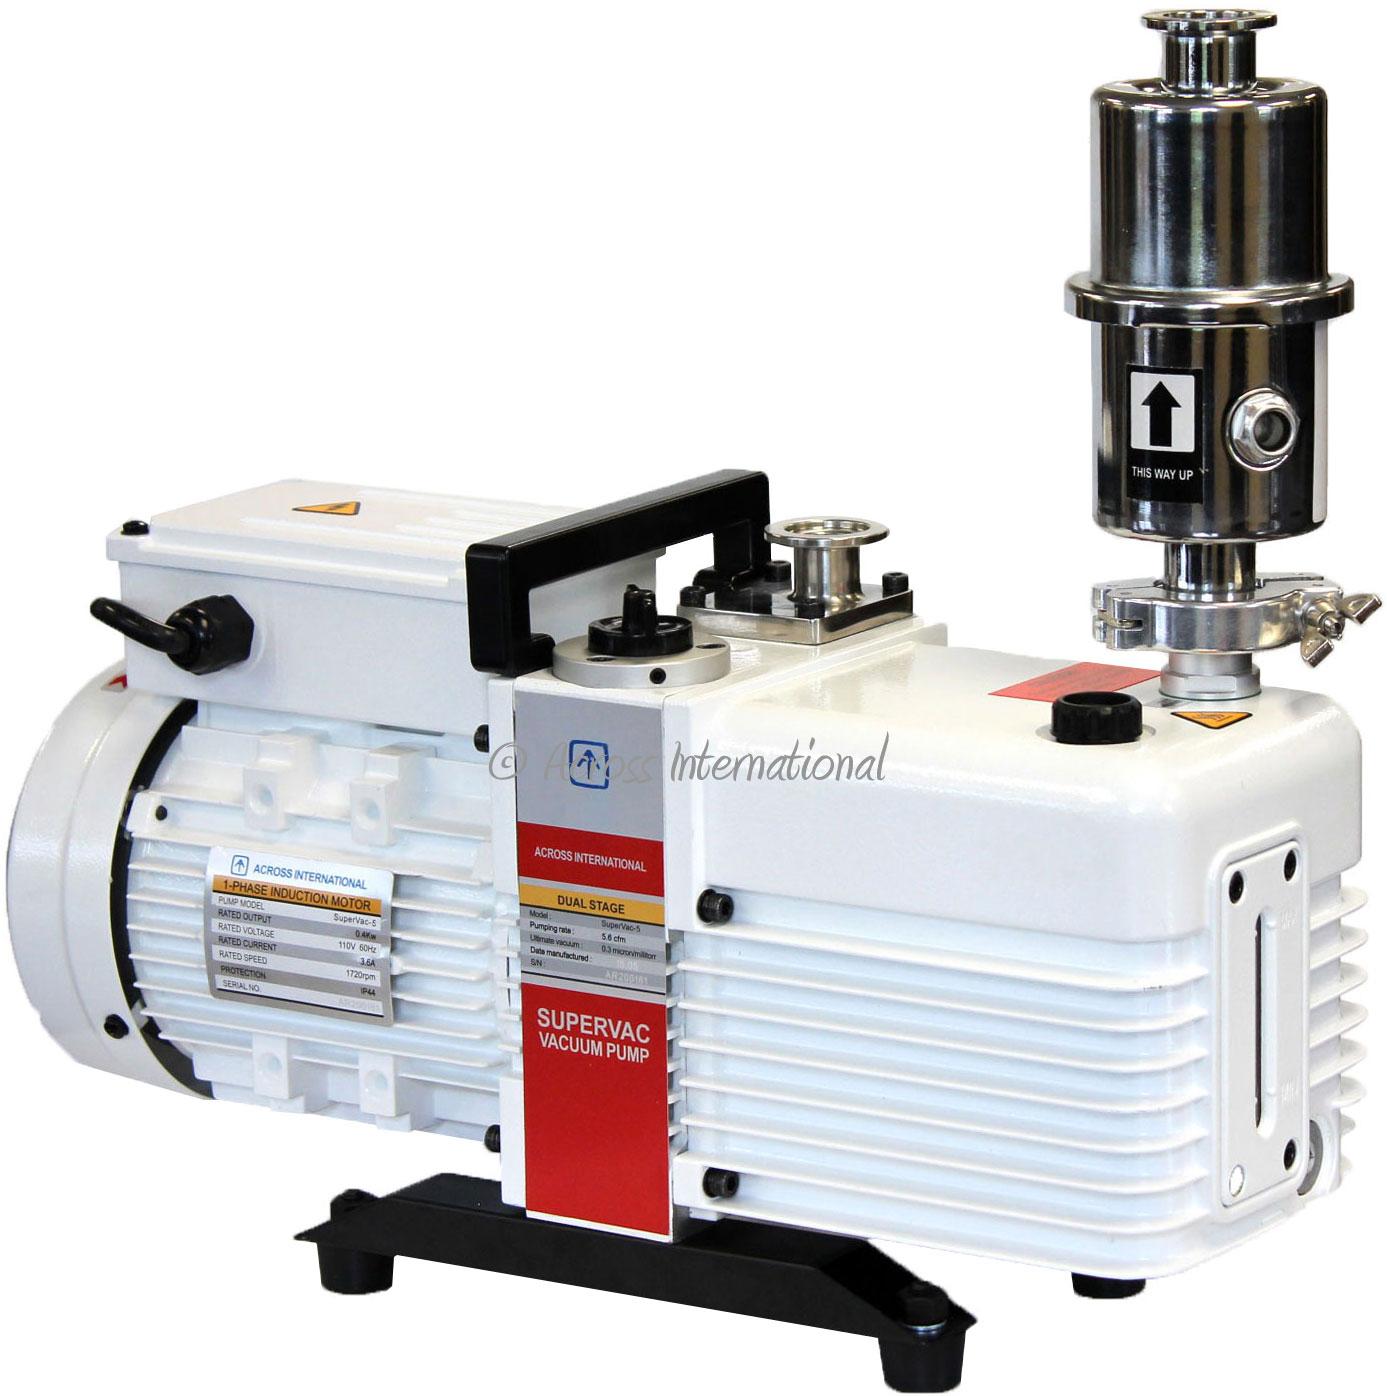 Across International SuperVac 5.6 CFM Commercial Grade 2-Stage Pump